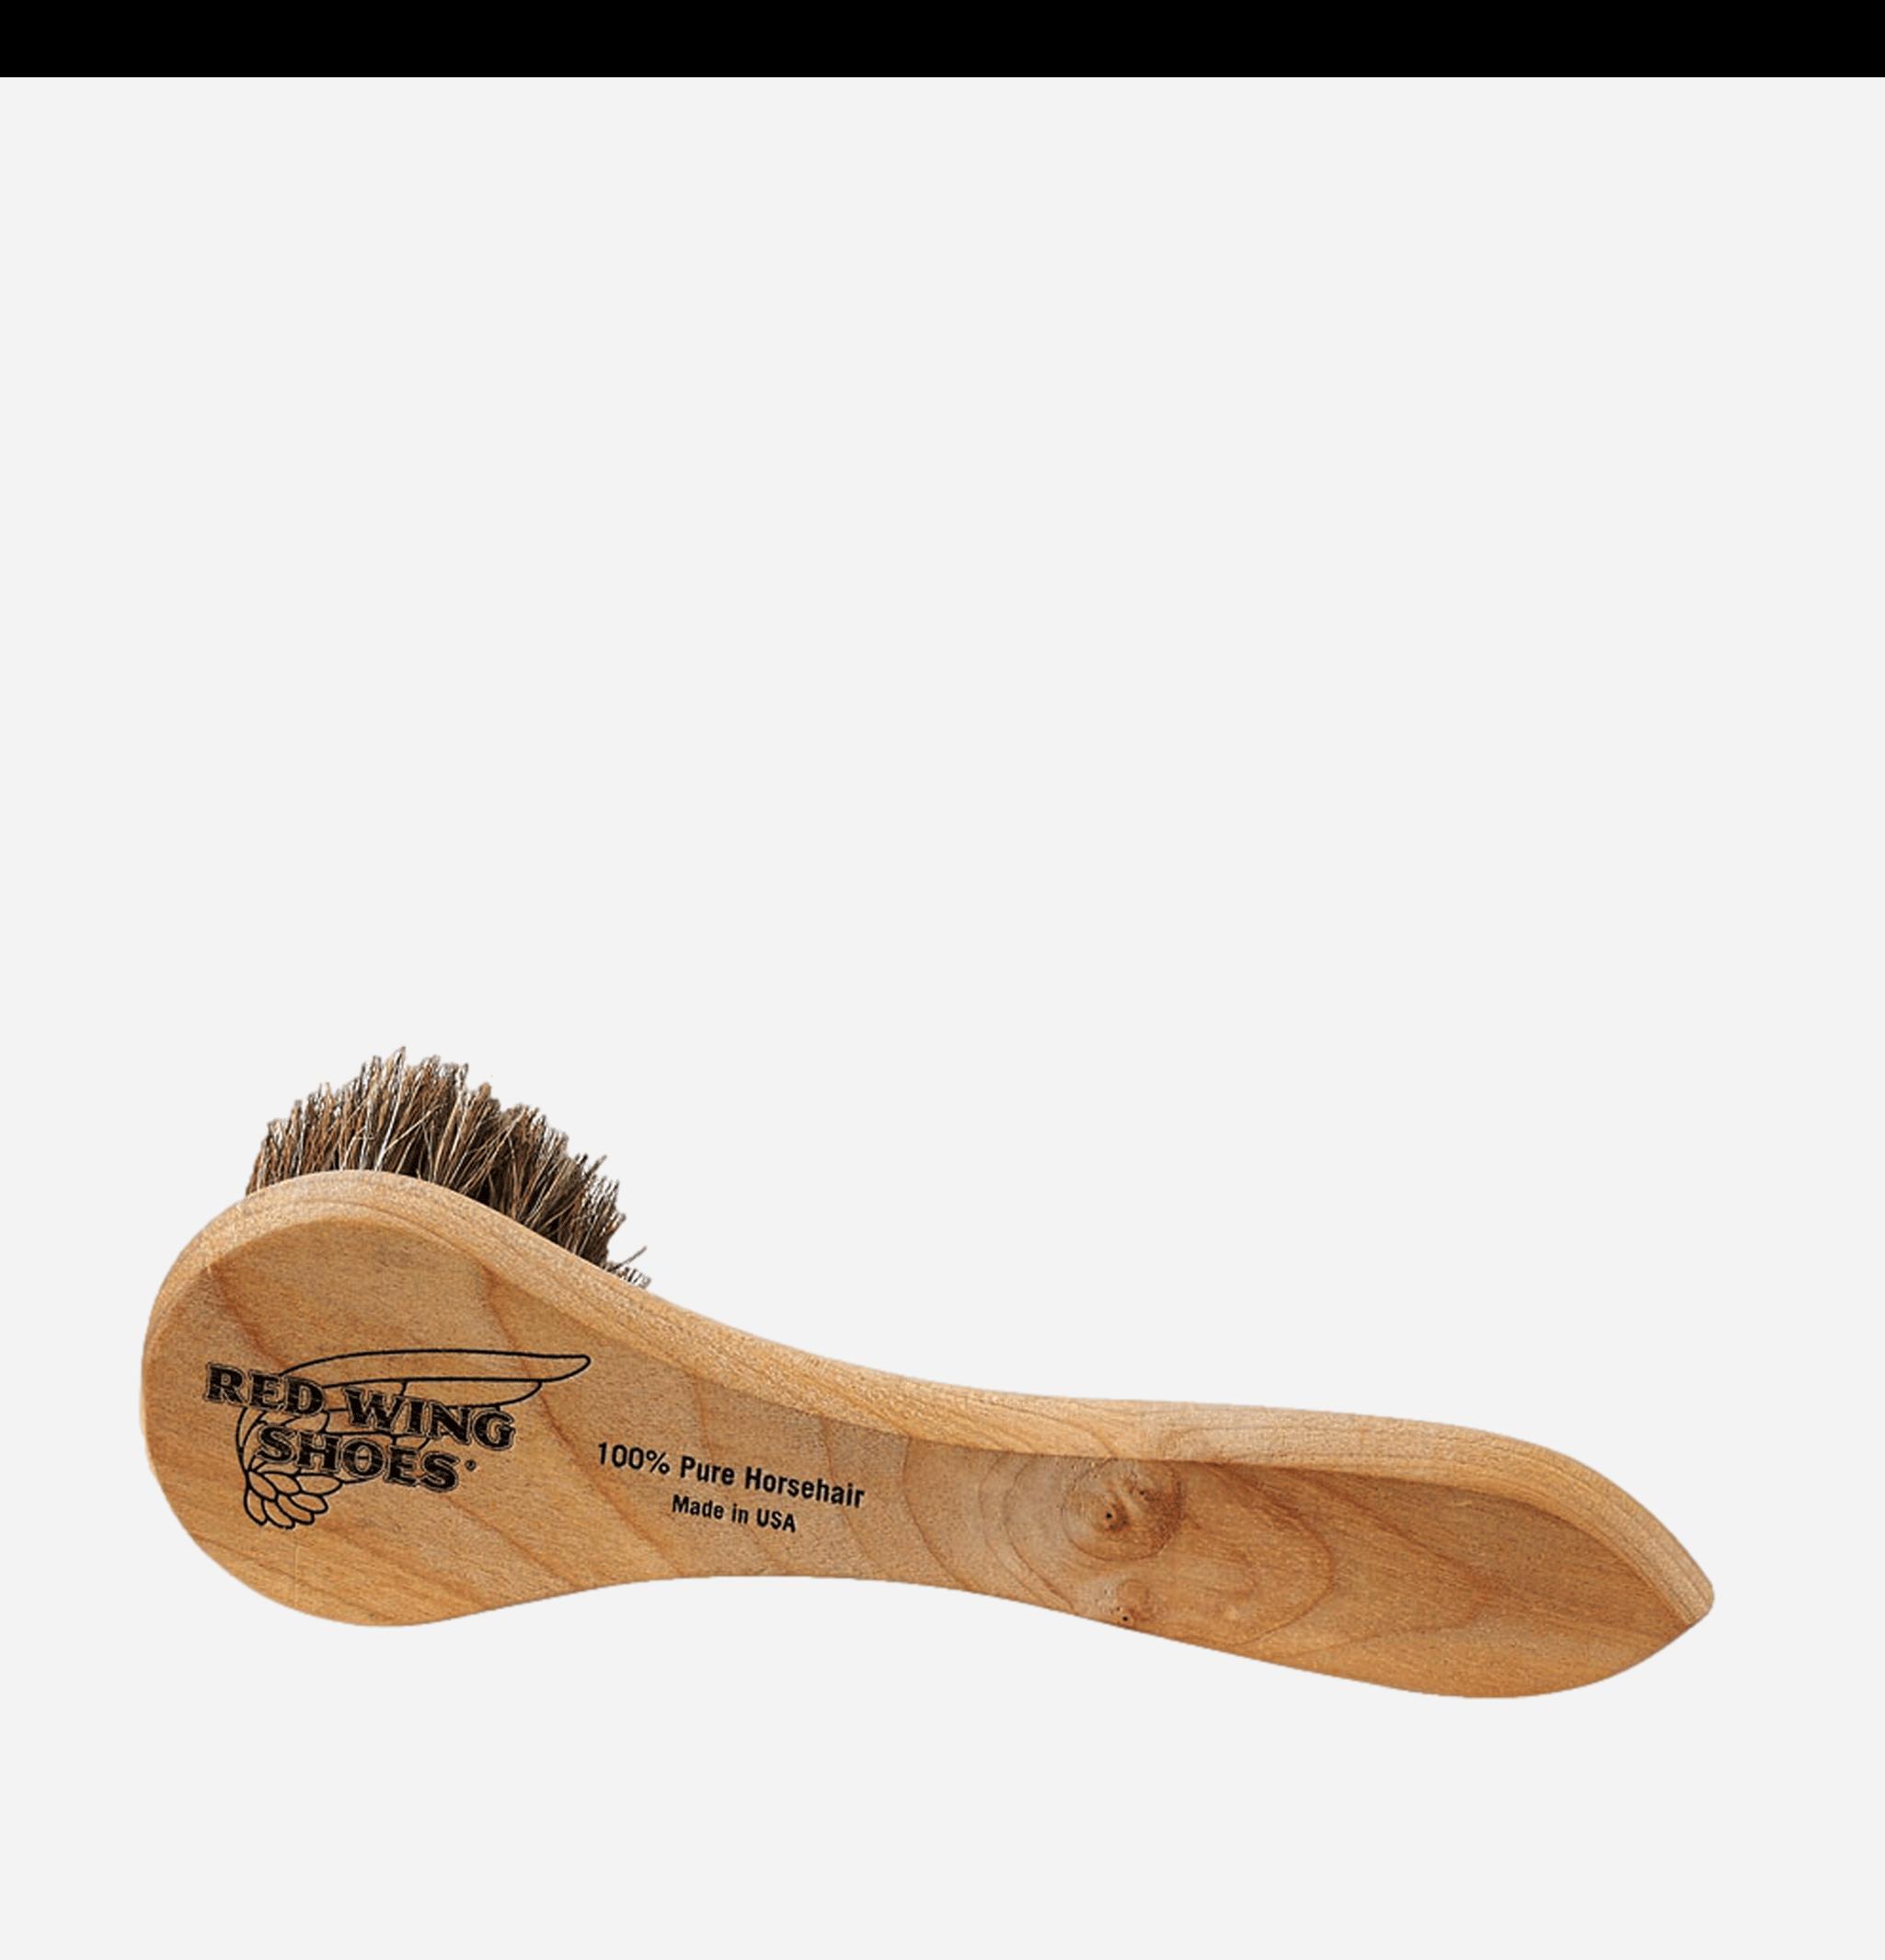 97114 - Dawber Brush